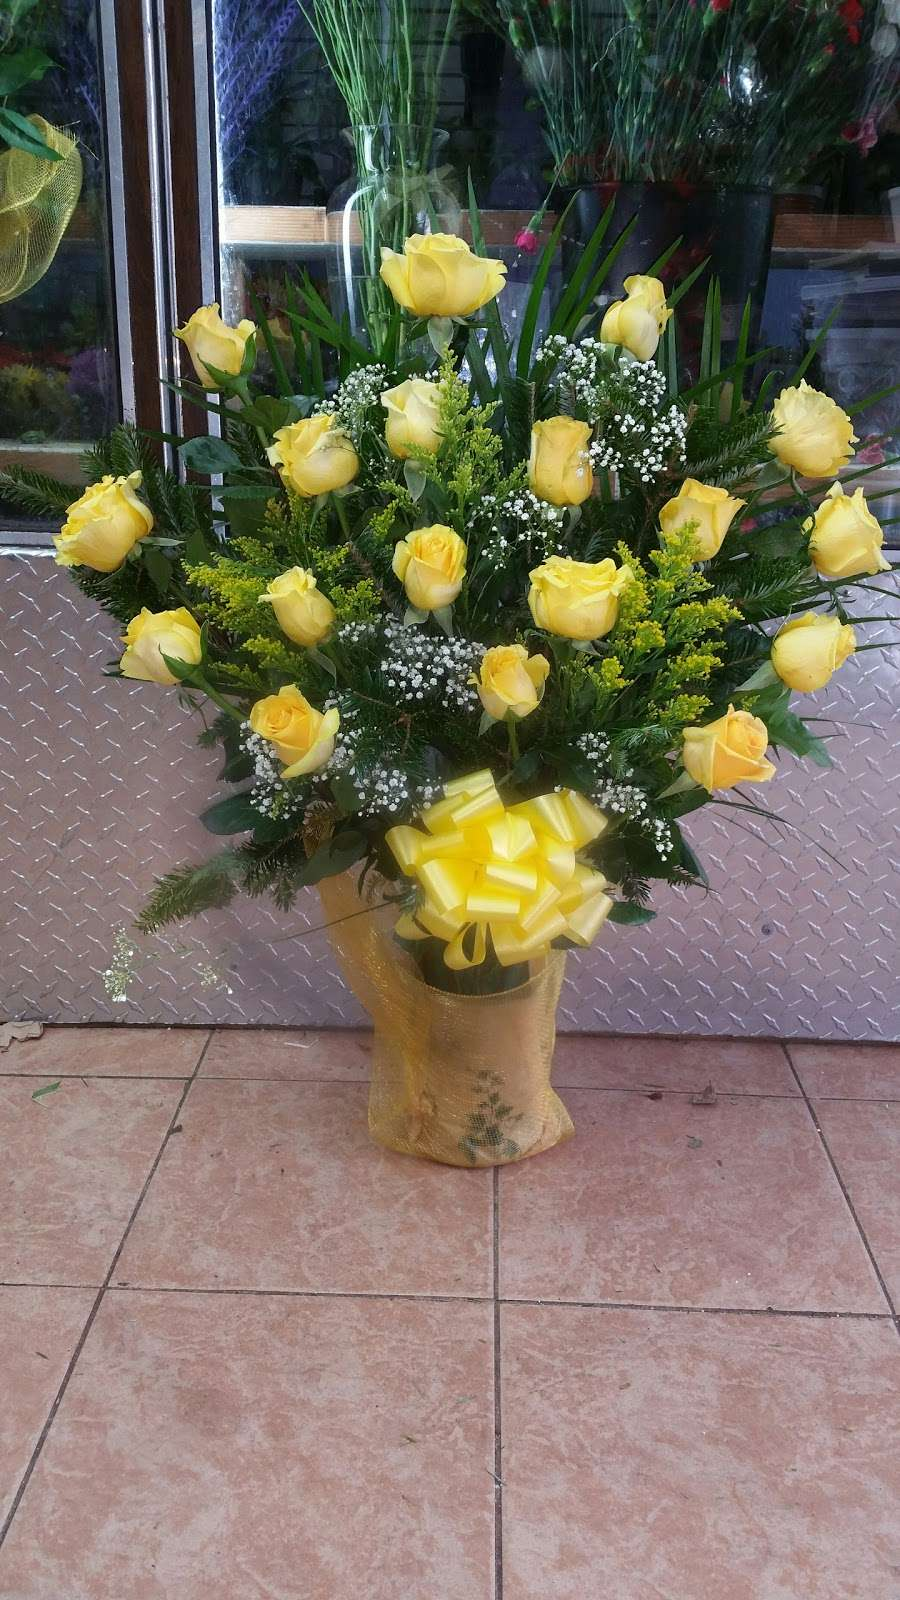 Yesenias Flowers - florist  | Photo 6 of 10 | Address: 1537 Castle Hill Ave, Bronx, NY 10462, USA | Phone: (347) 657-0022